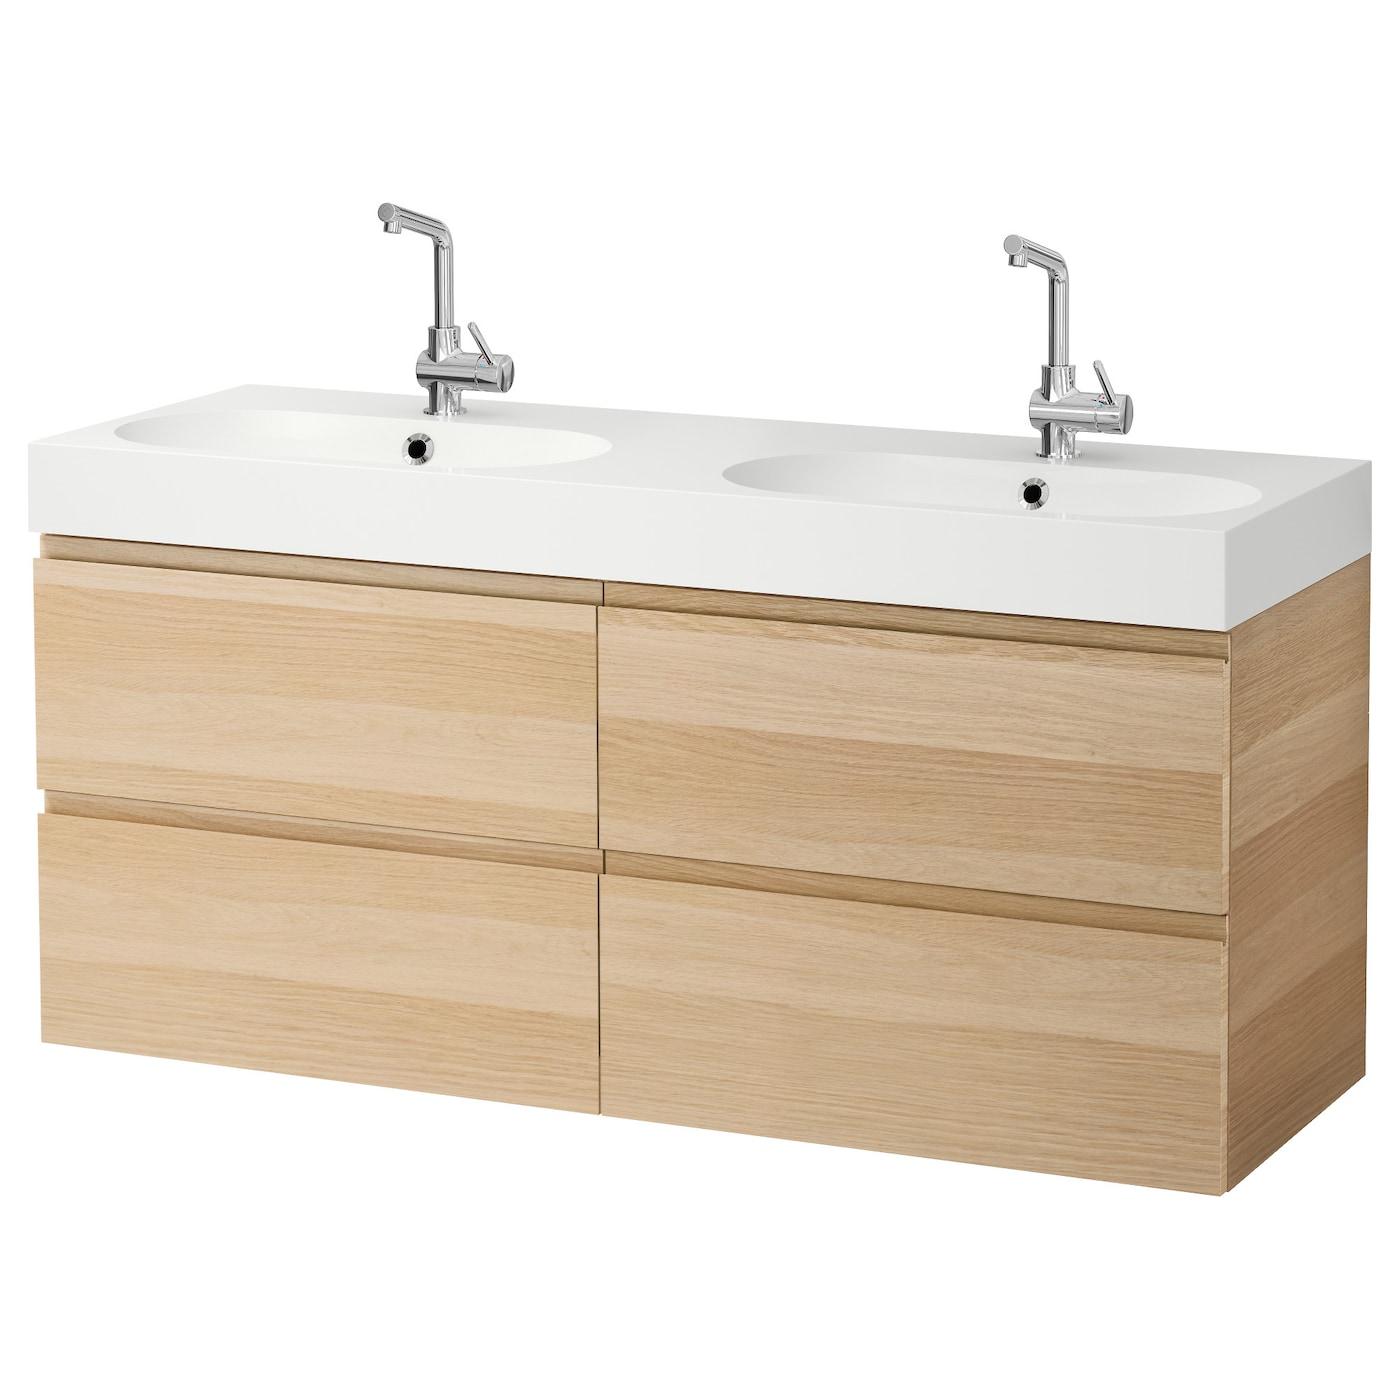 br viken godmorgon meuble lavabo 4tir effet ch ne blanchi. Black Bedroom Furniture Sets. Home Design Ideas